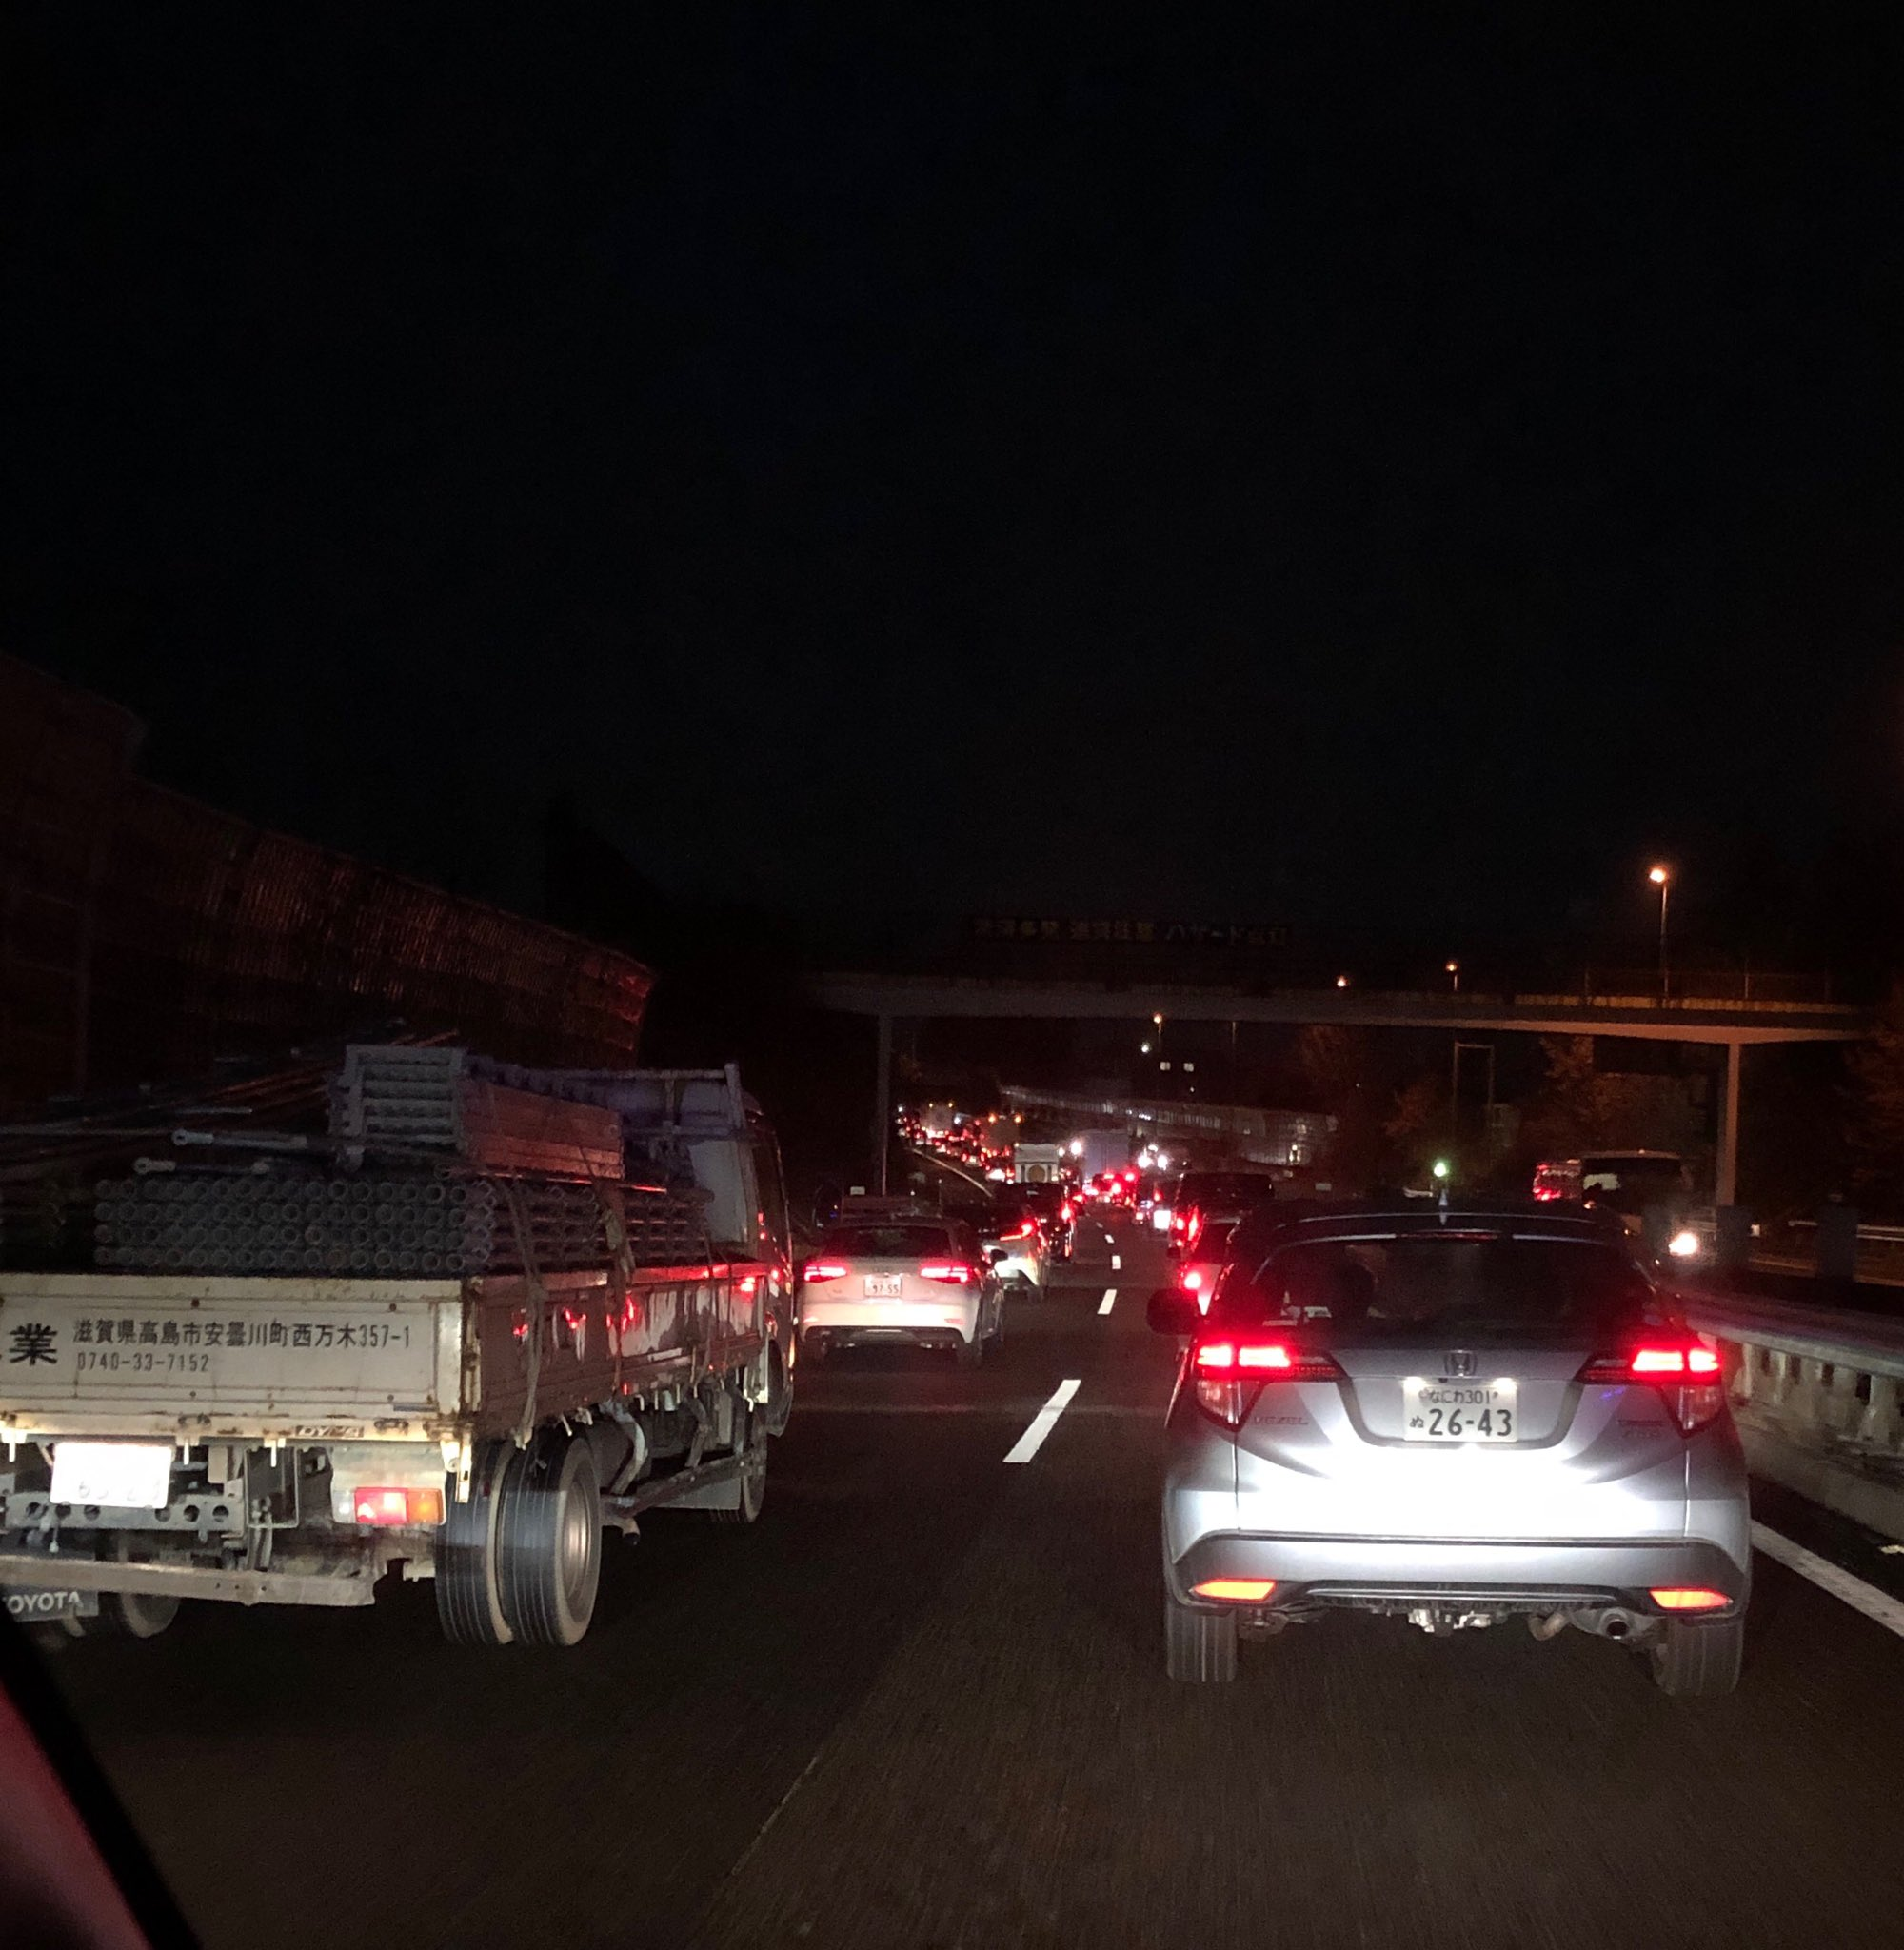 画像,名神高速、大津で事故渋滞‼️最悪…😭 https://t.co/HaYRMeRpsW。